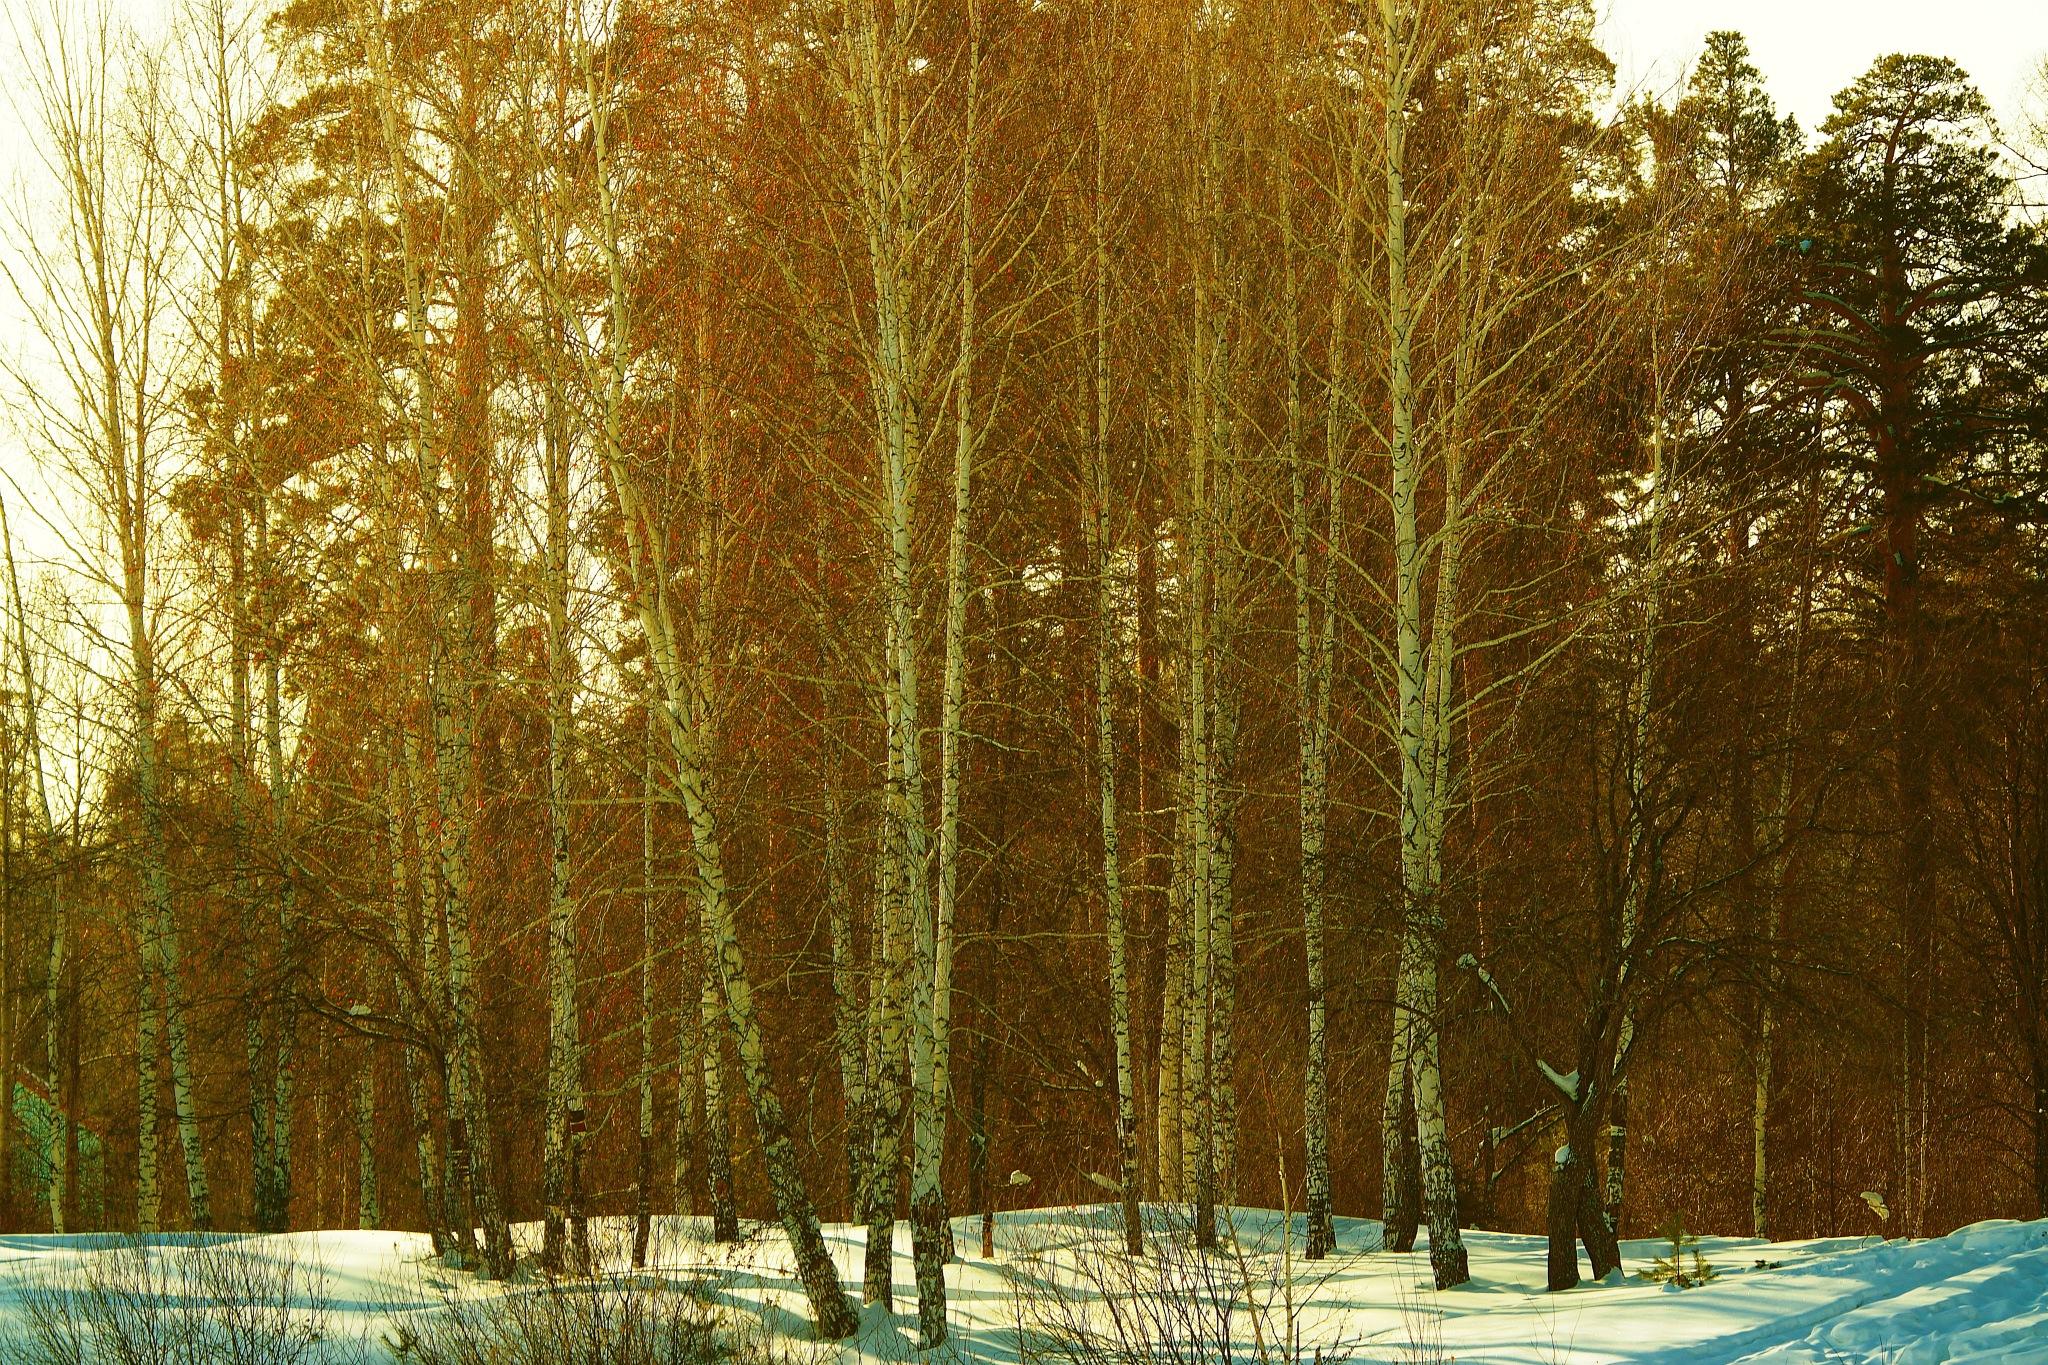 Silver birches of February by sergey.parfeniuk